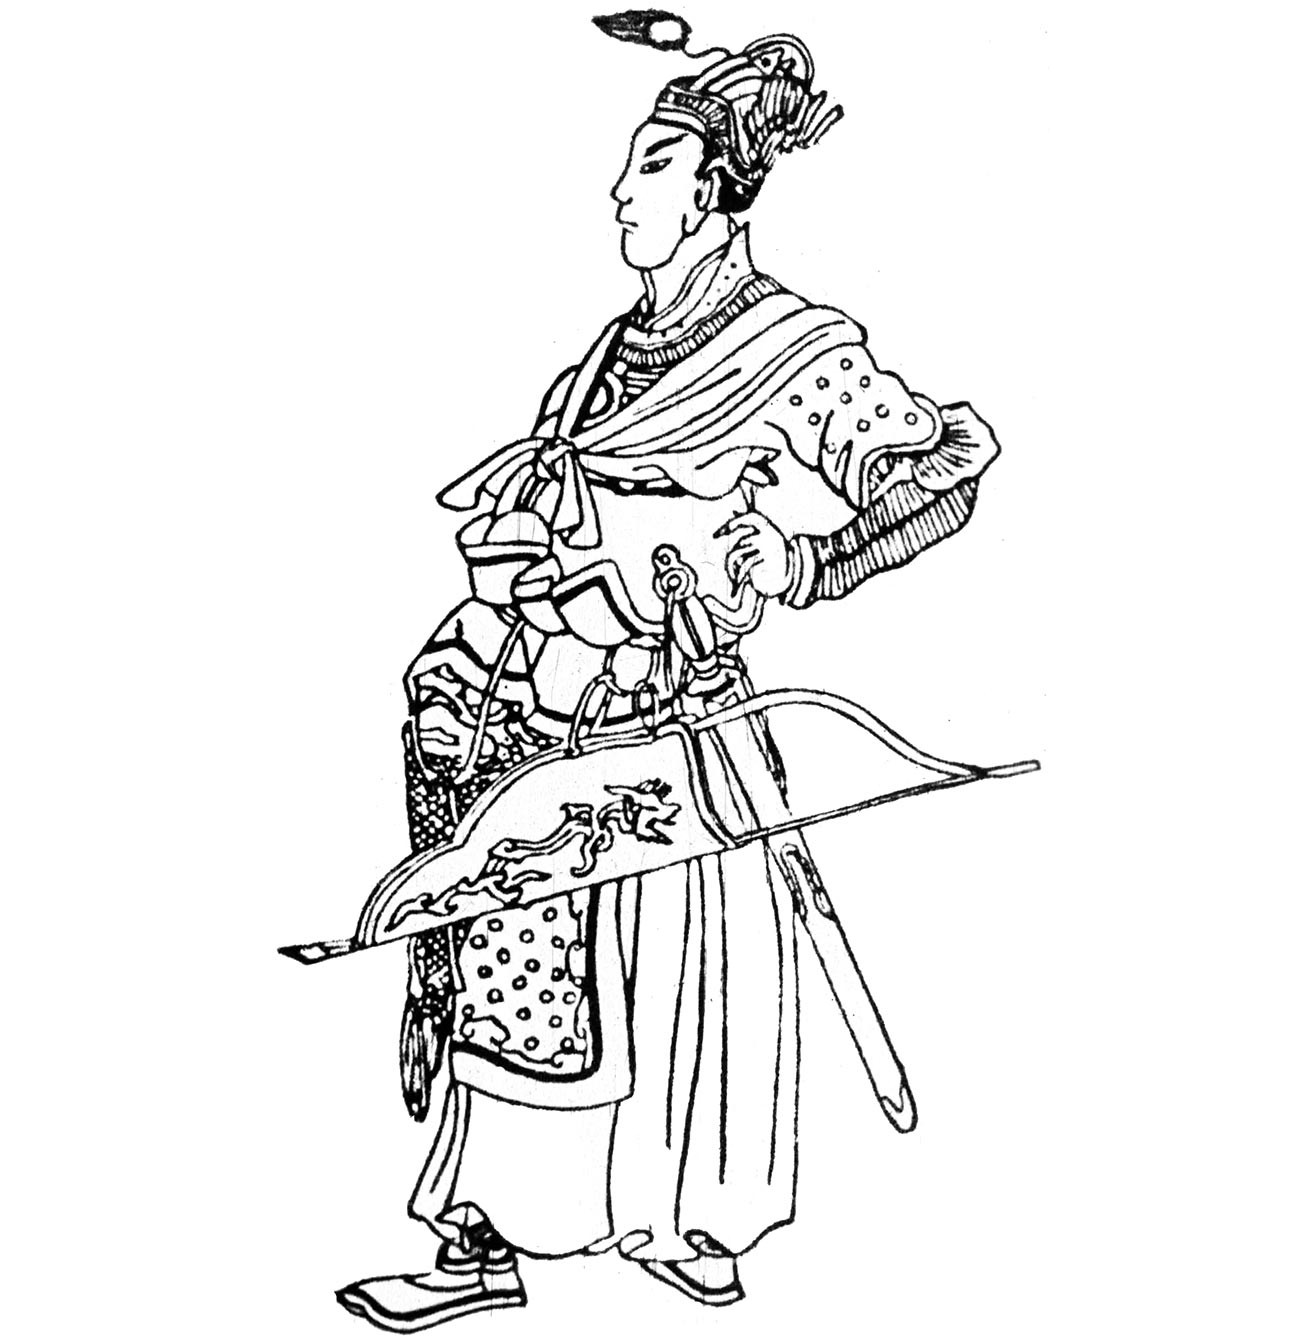 Le khan Batu, dessin médiéval chinois